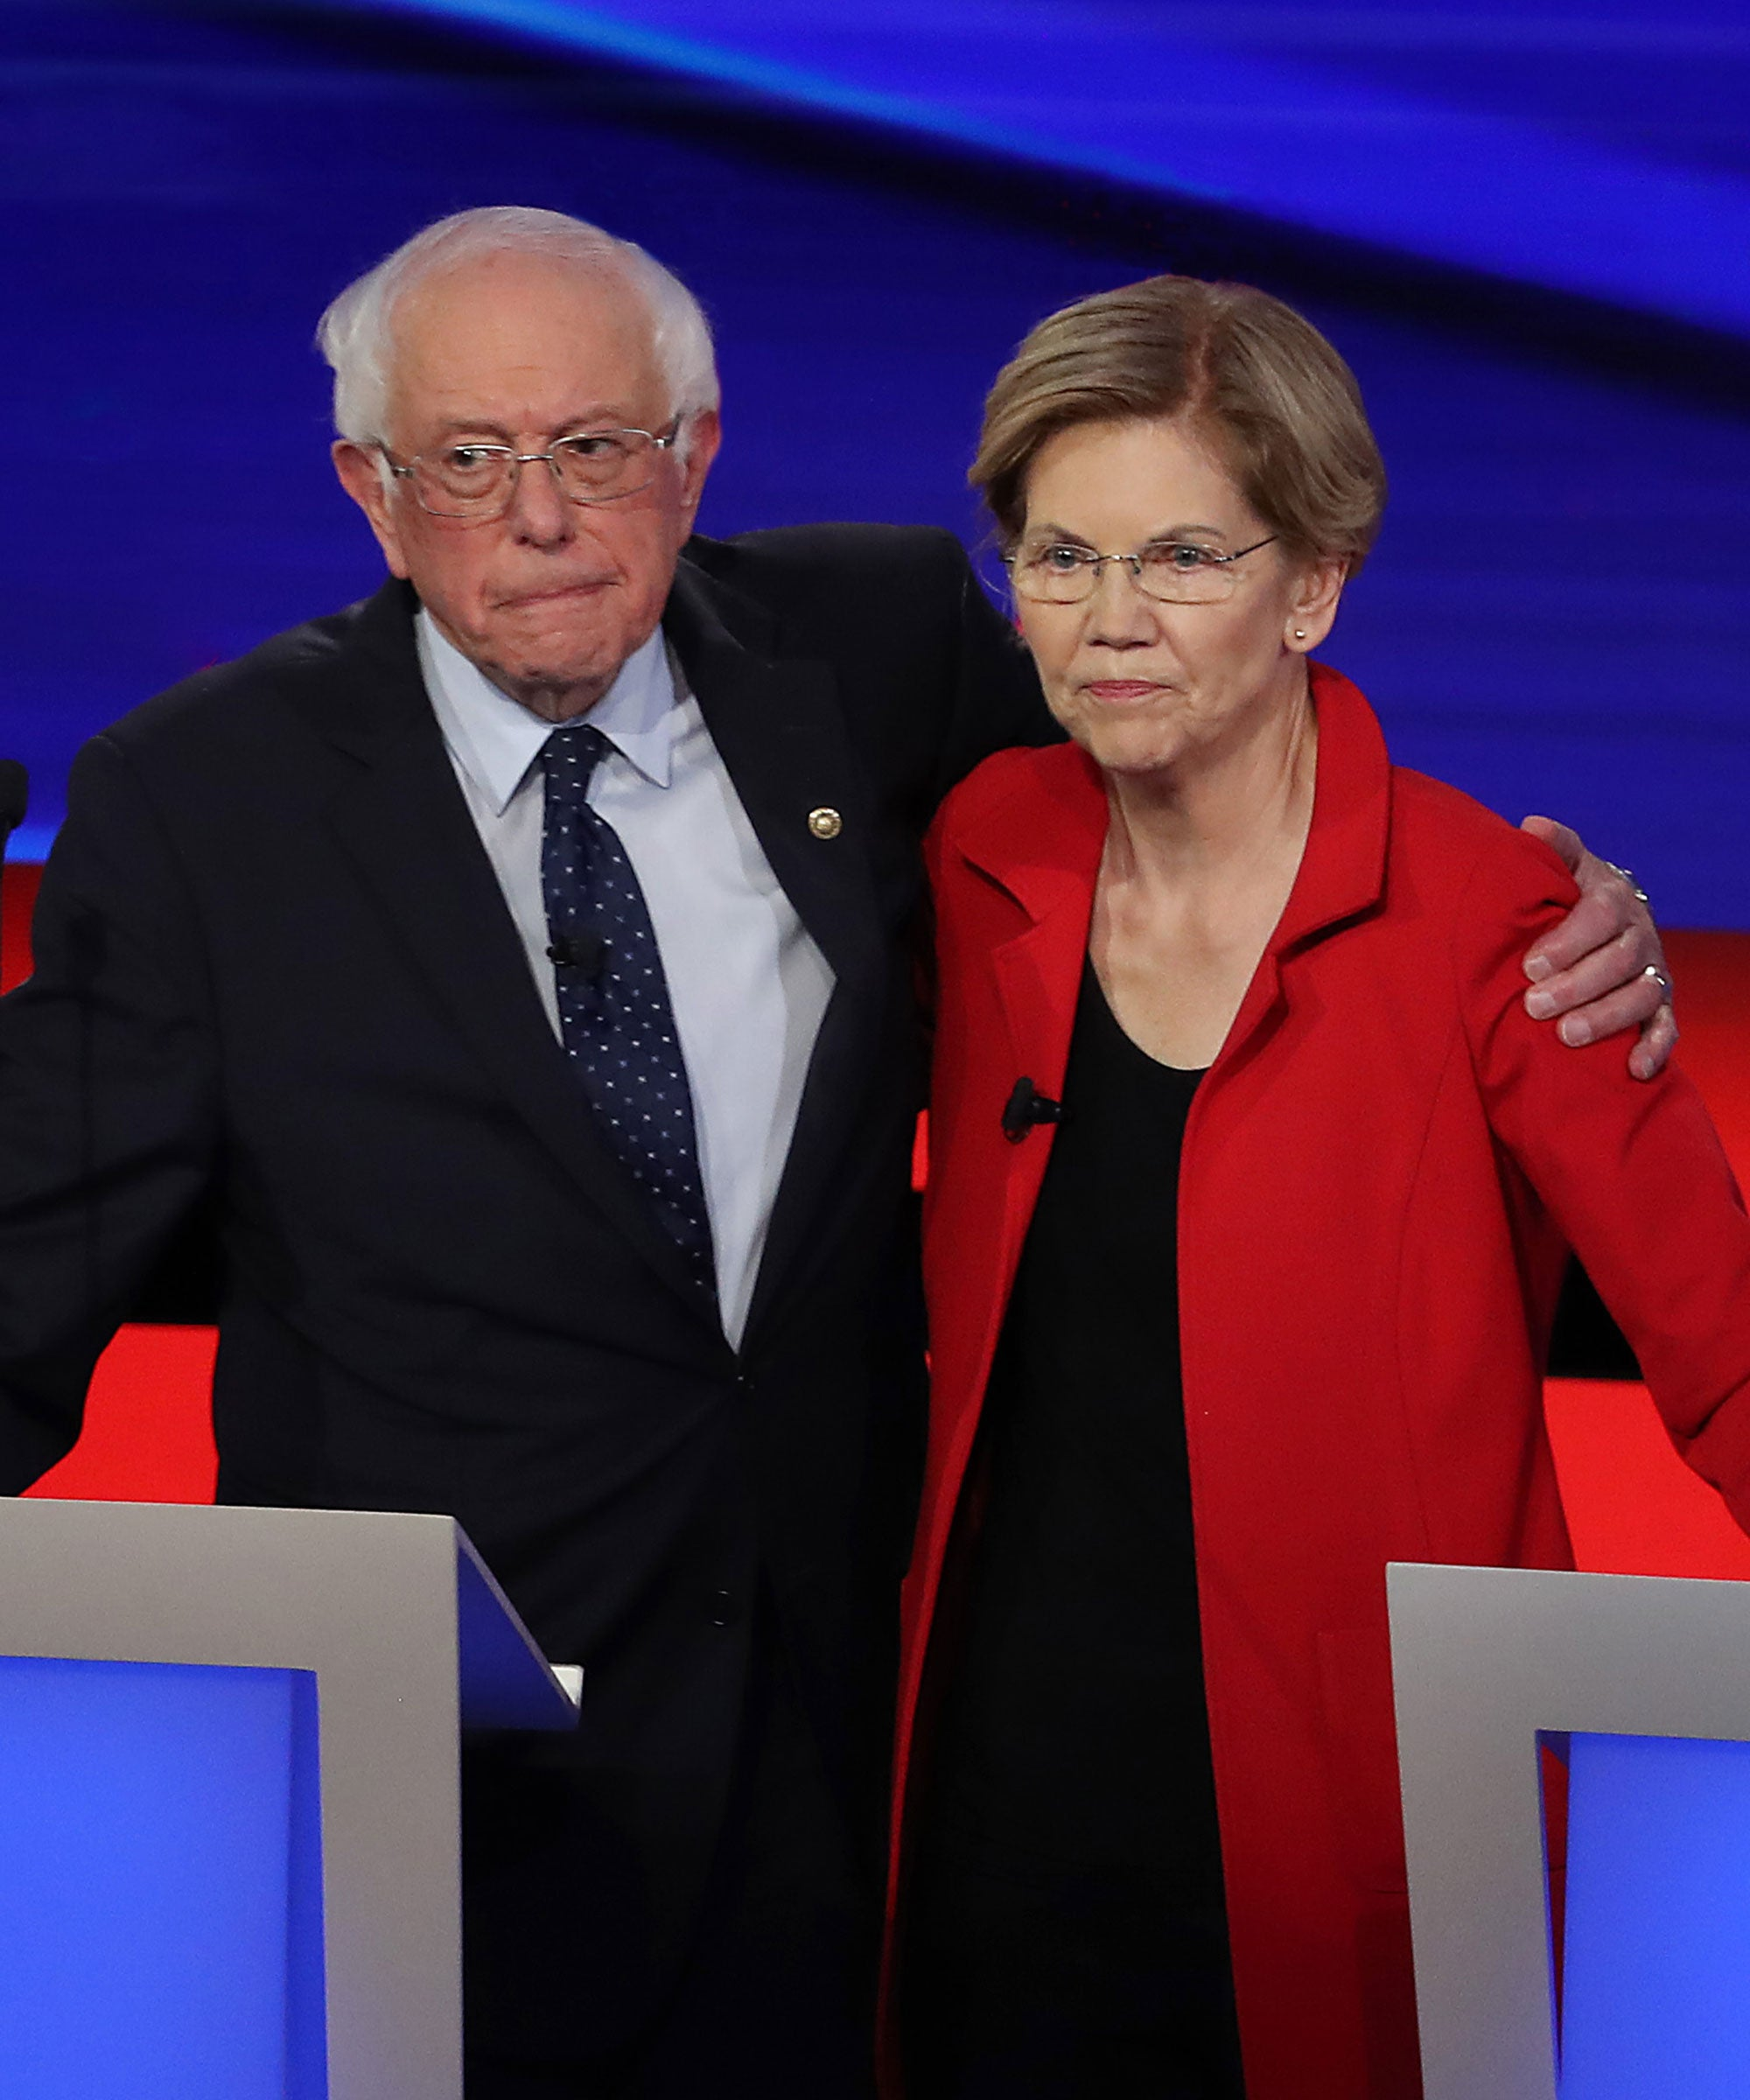 All 7 Democratic Candidates Threaten To Skip Debate Over Labor Dispute